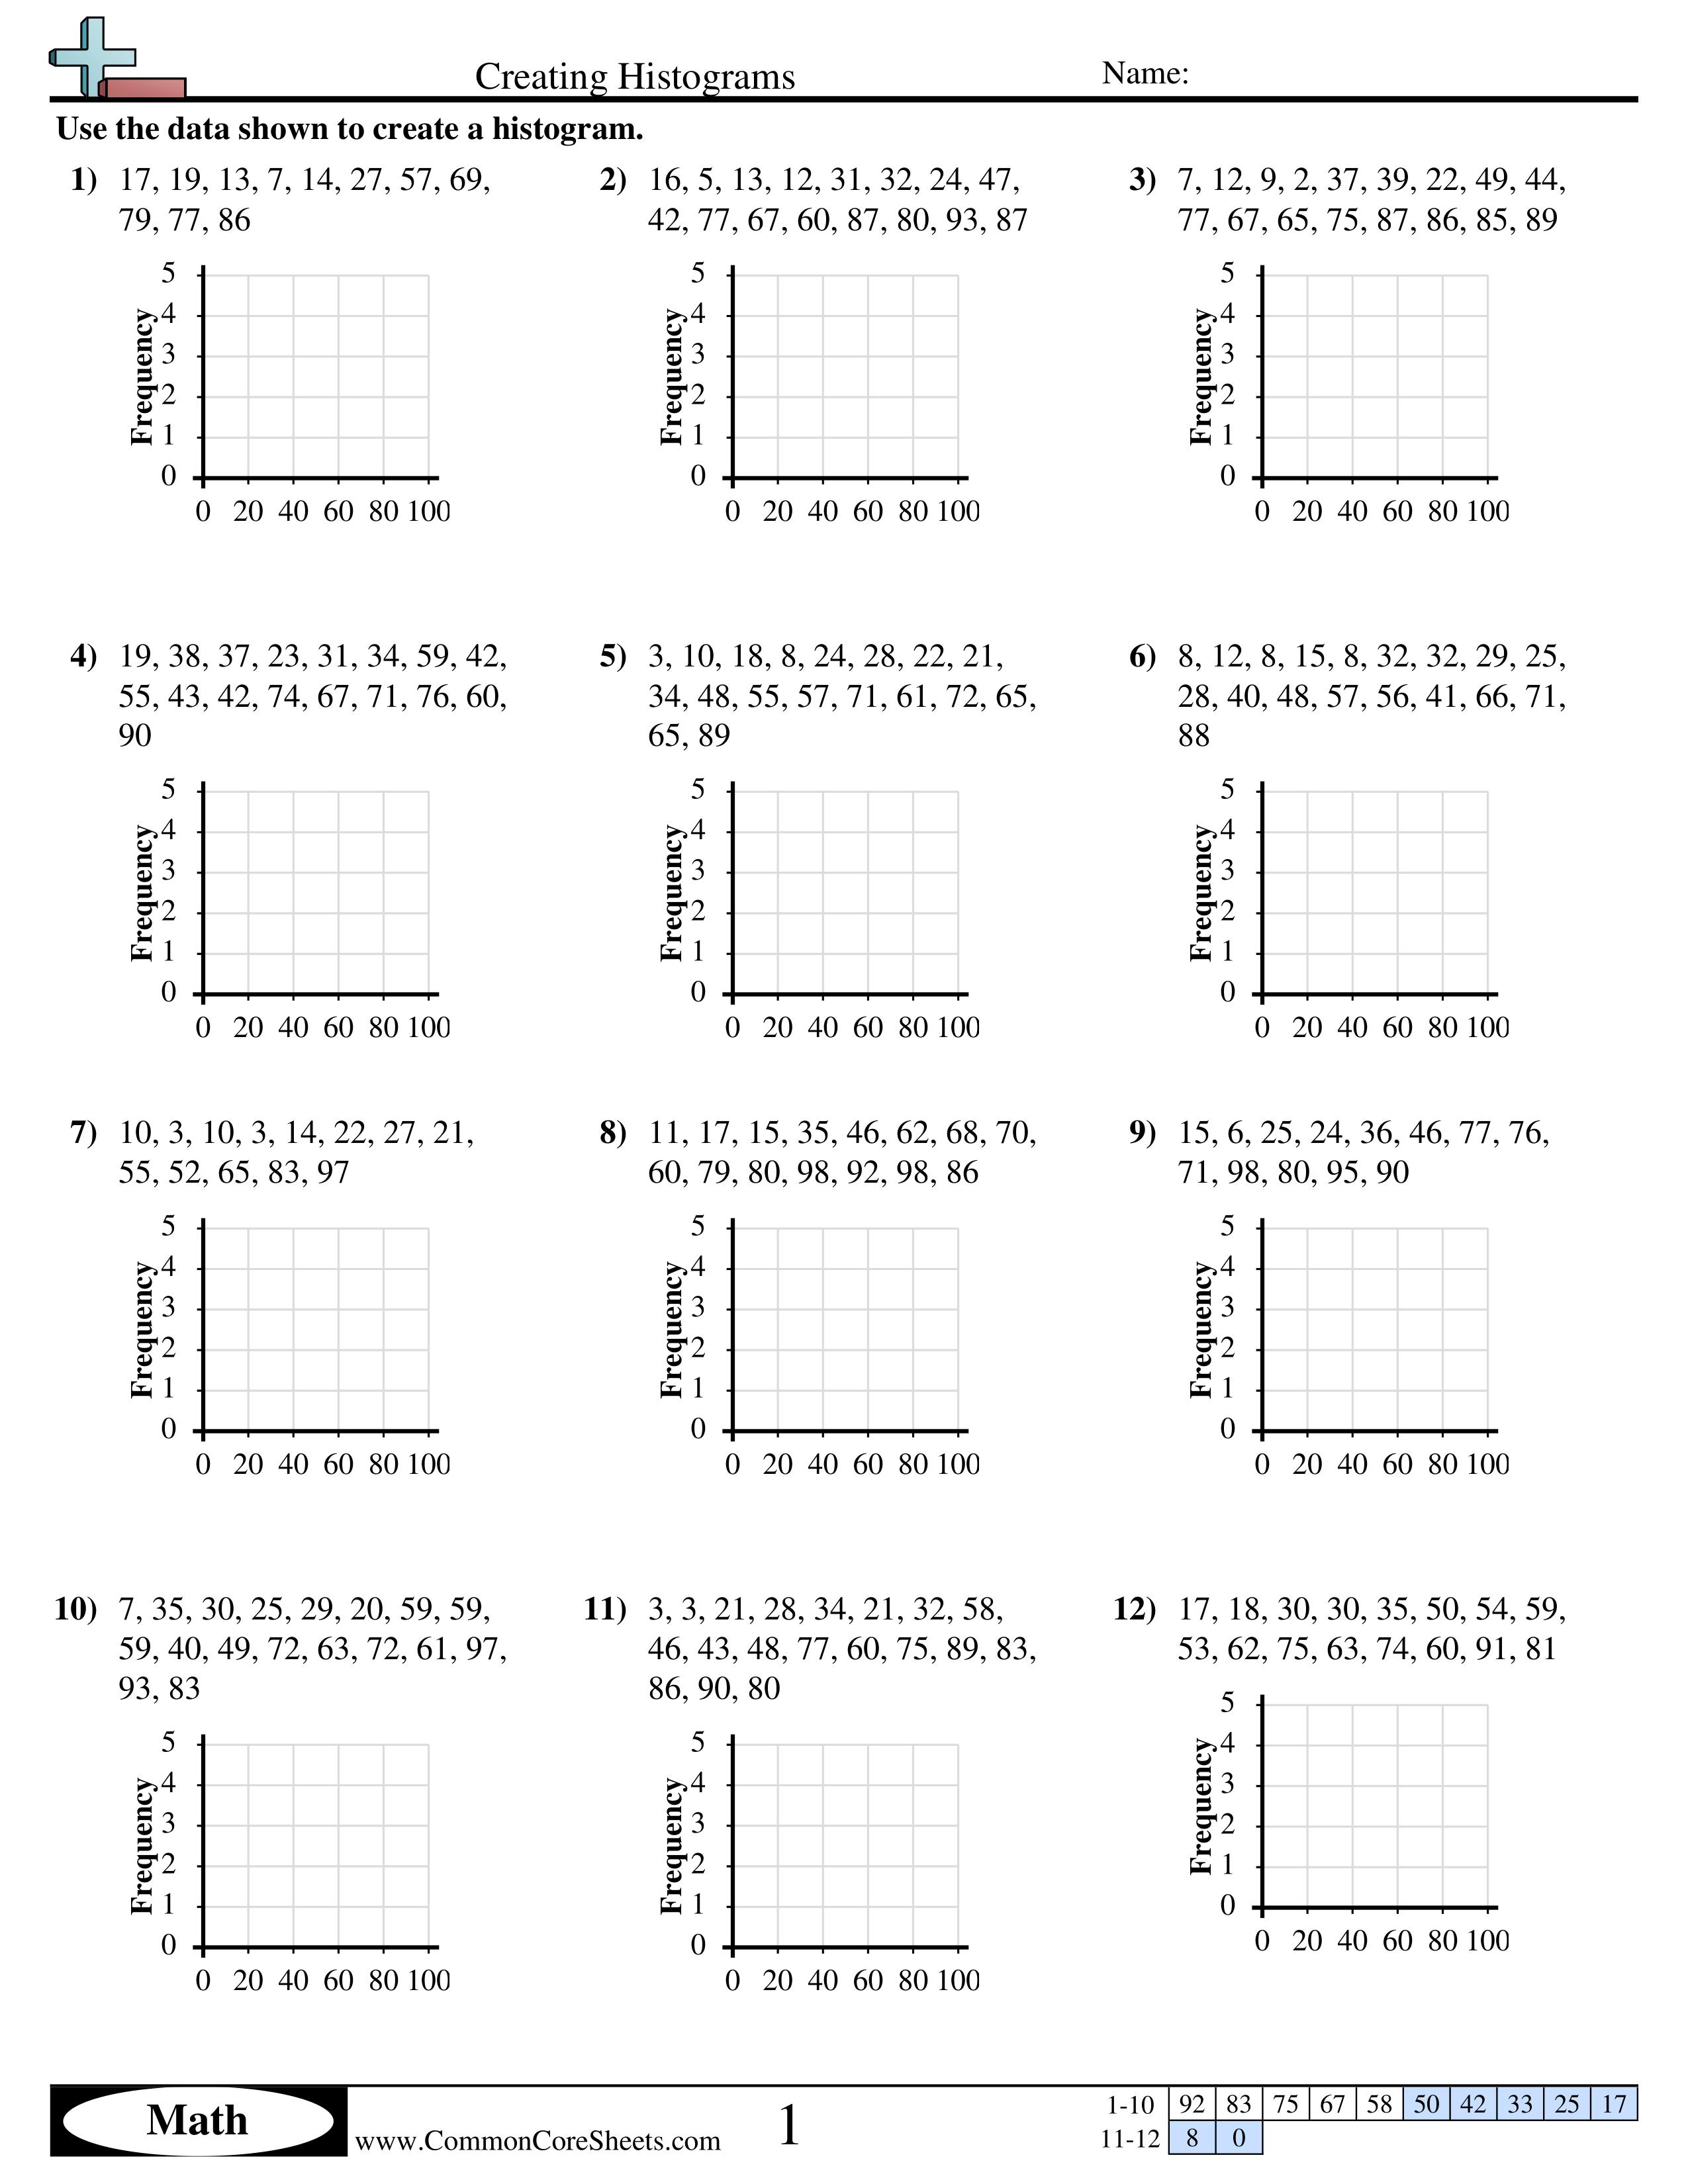 Creating Histograms Worksheet